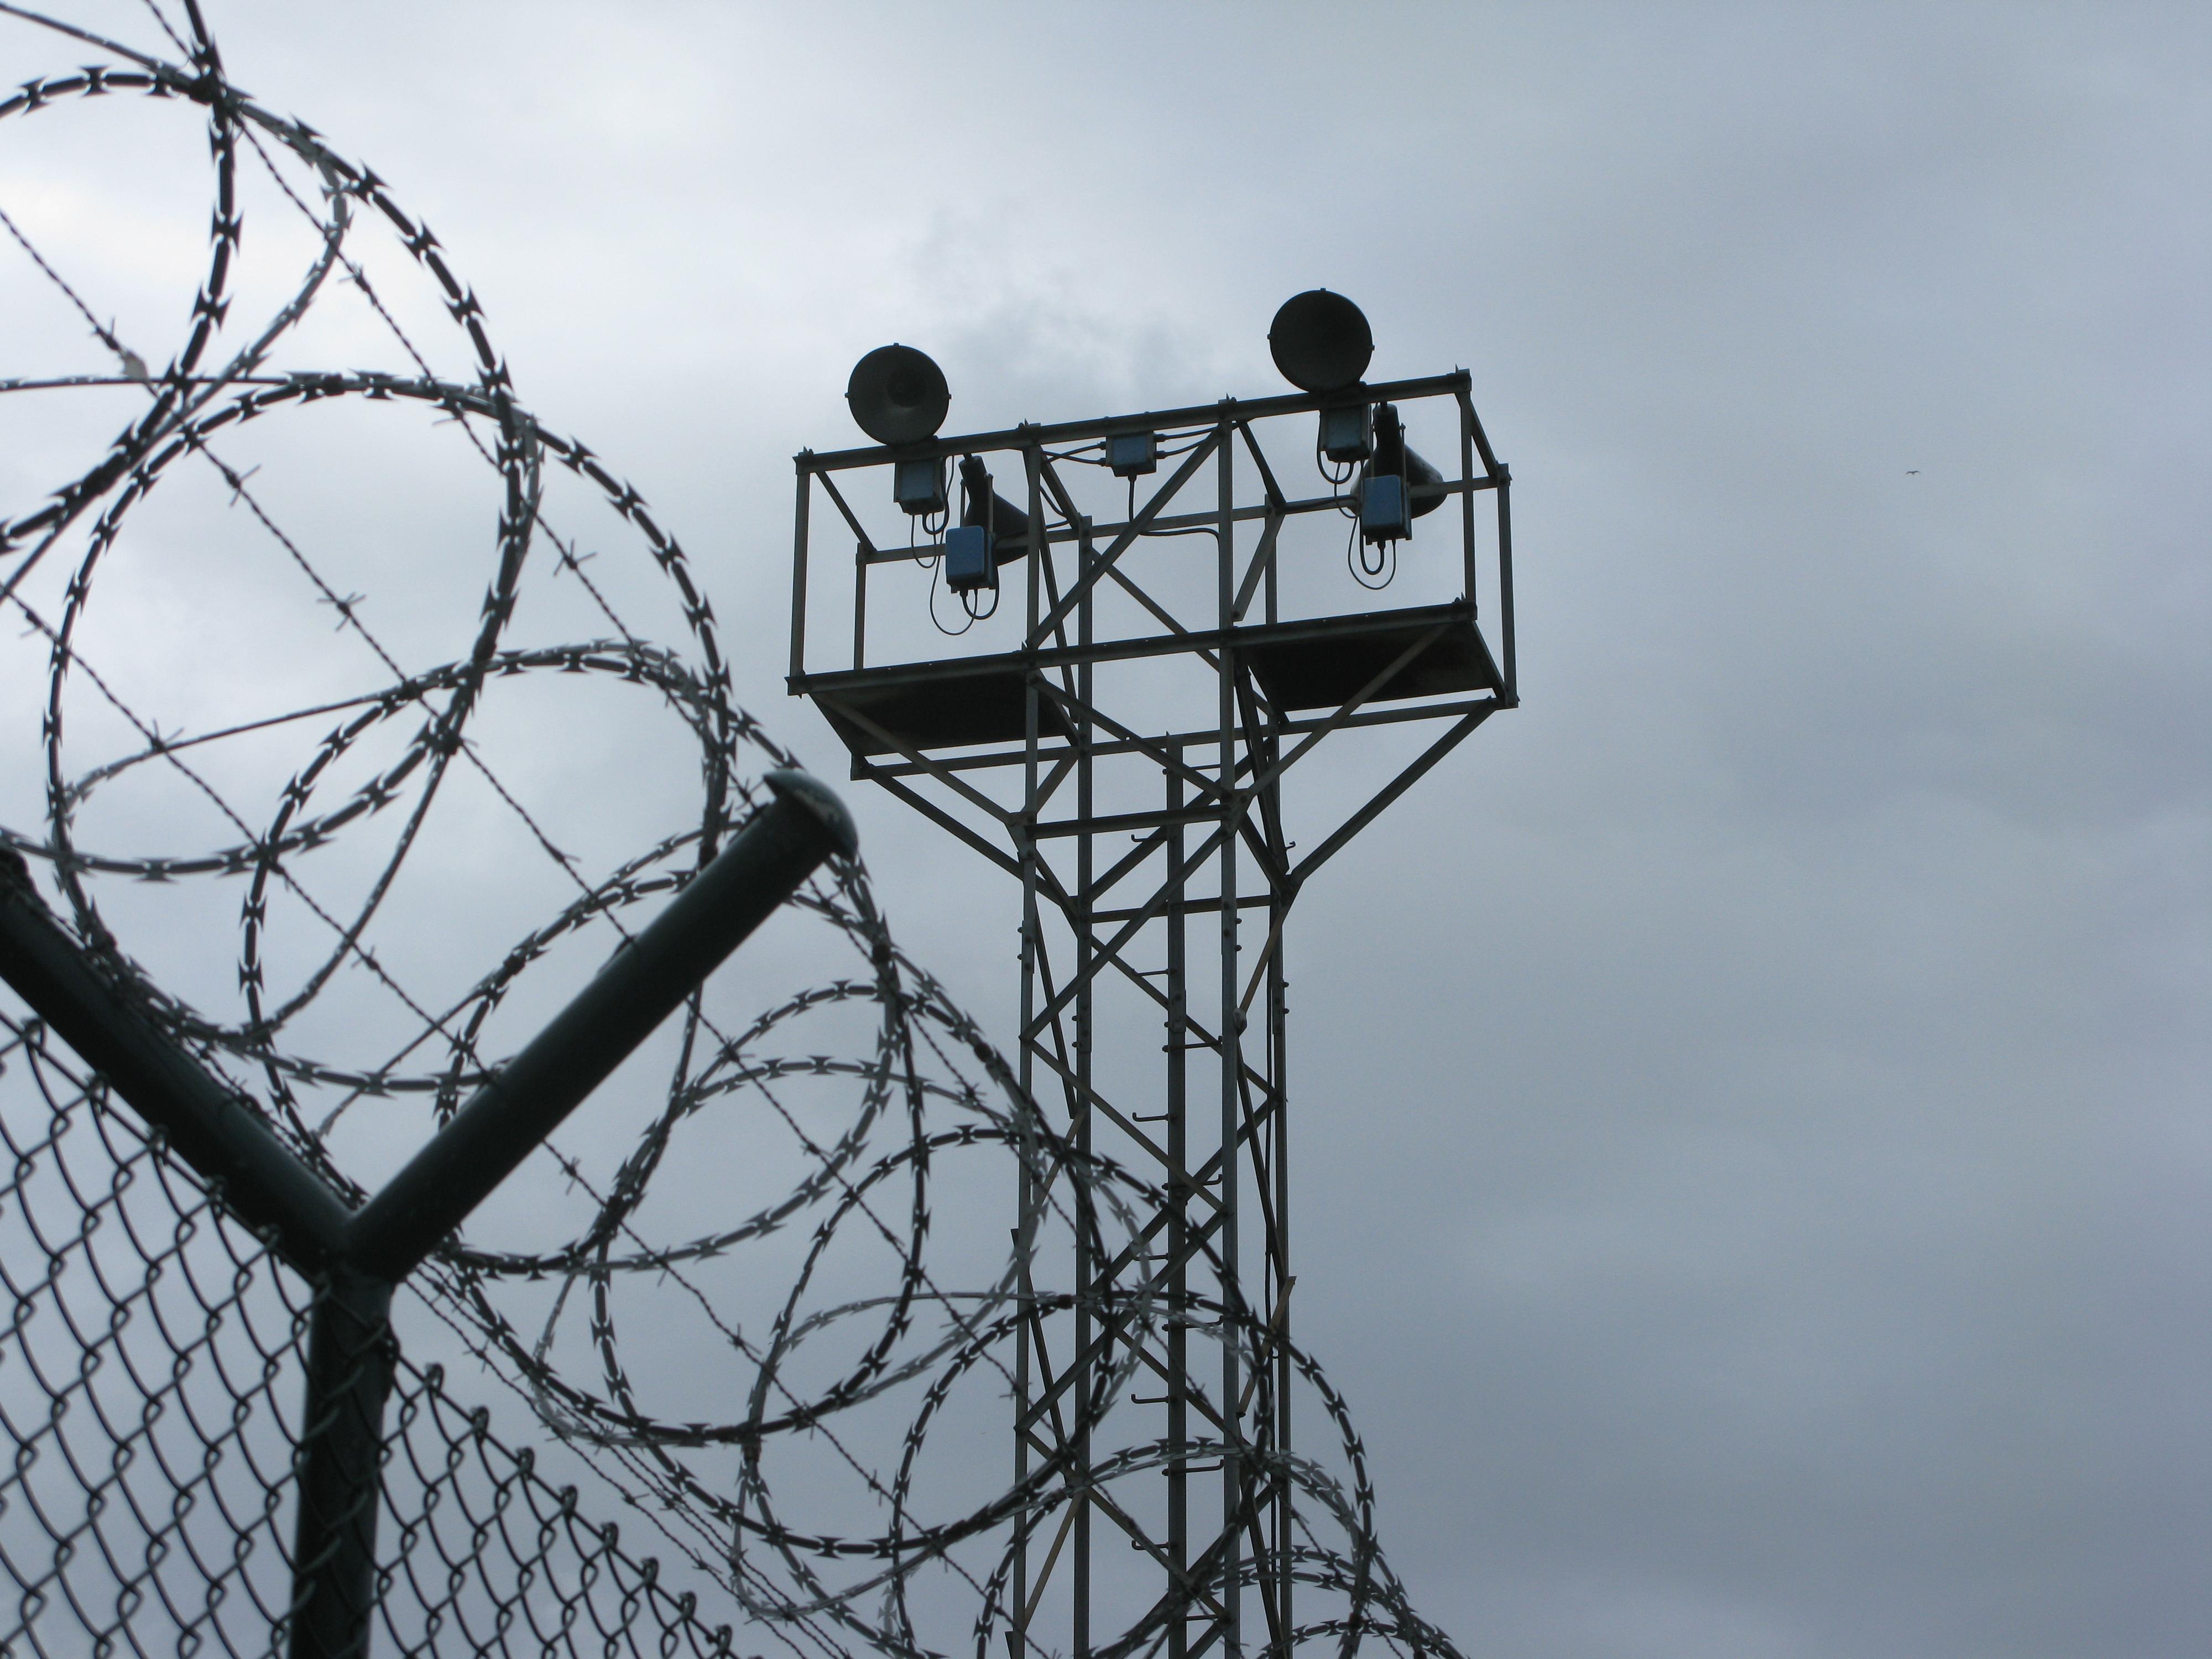 prison sxc